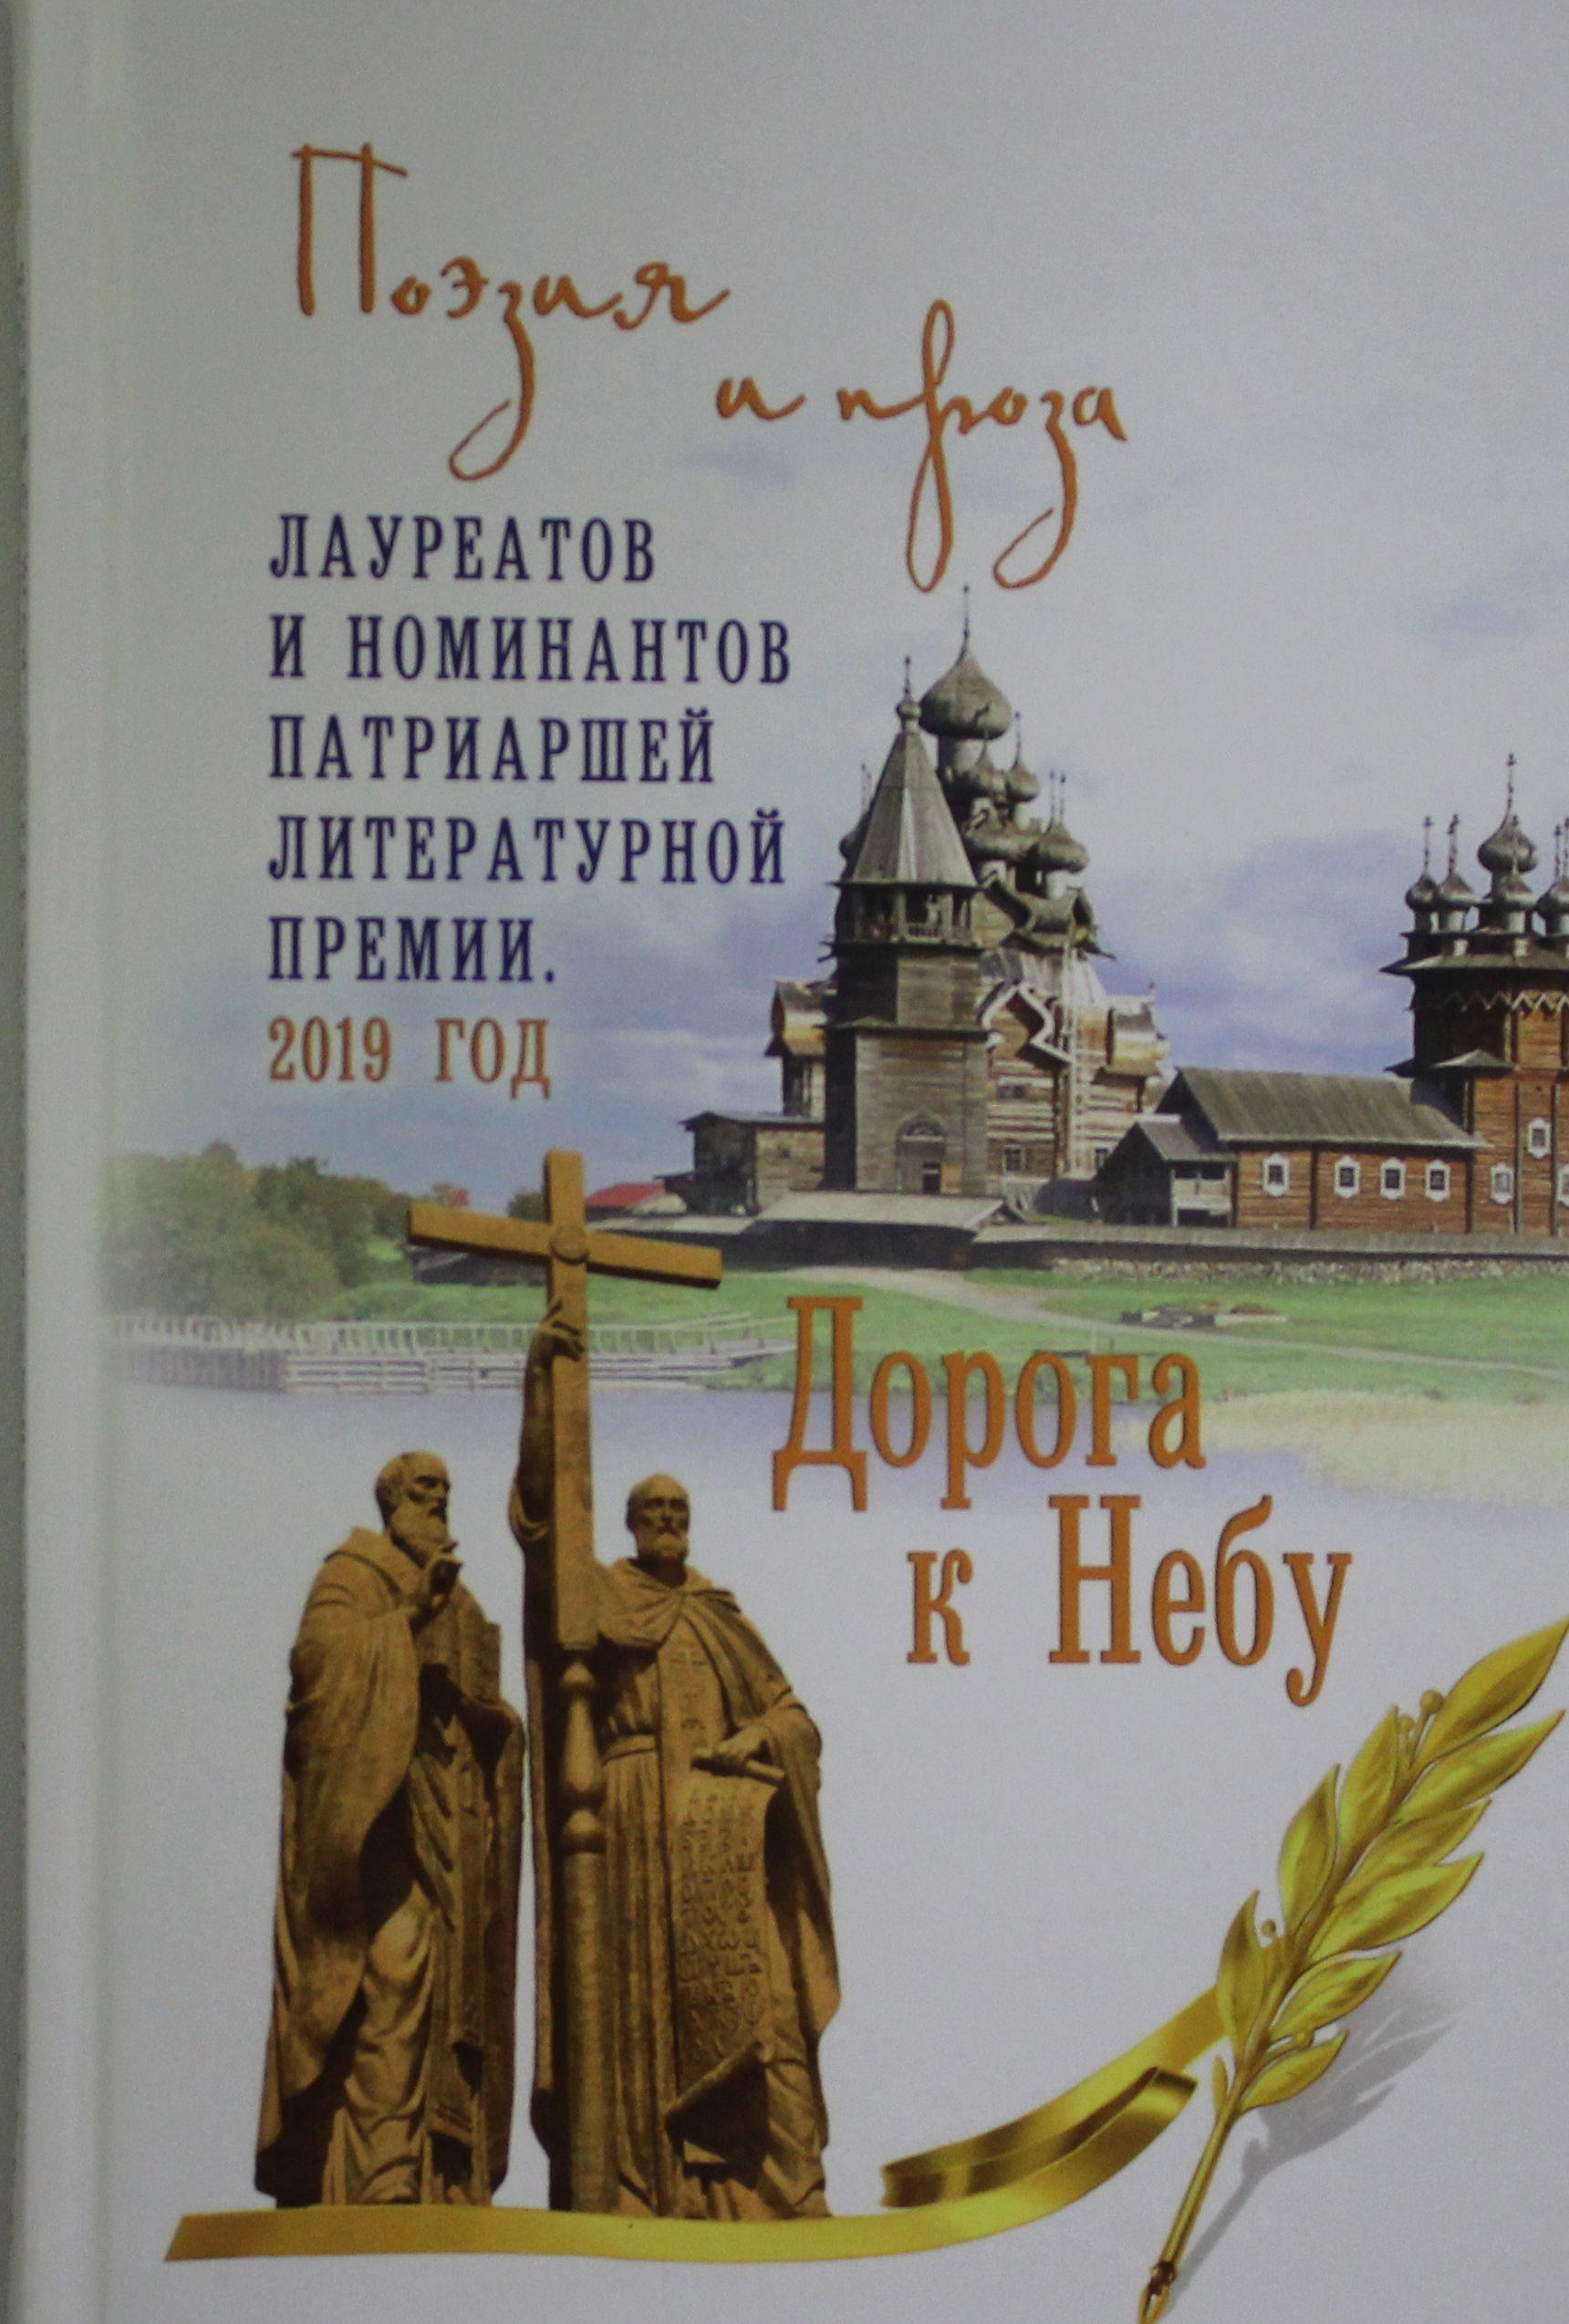 NOM Doroga k Nebu. Poezija i proza laureatov i nominantov Patriarshej literaturnoj premii. 2019 g.